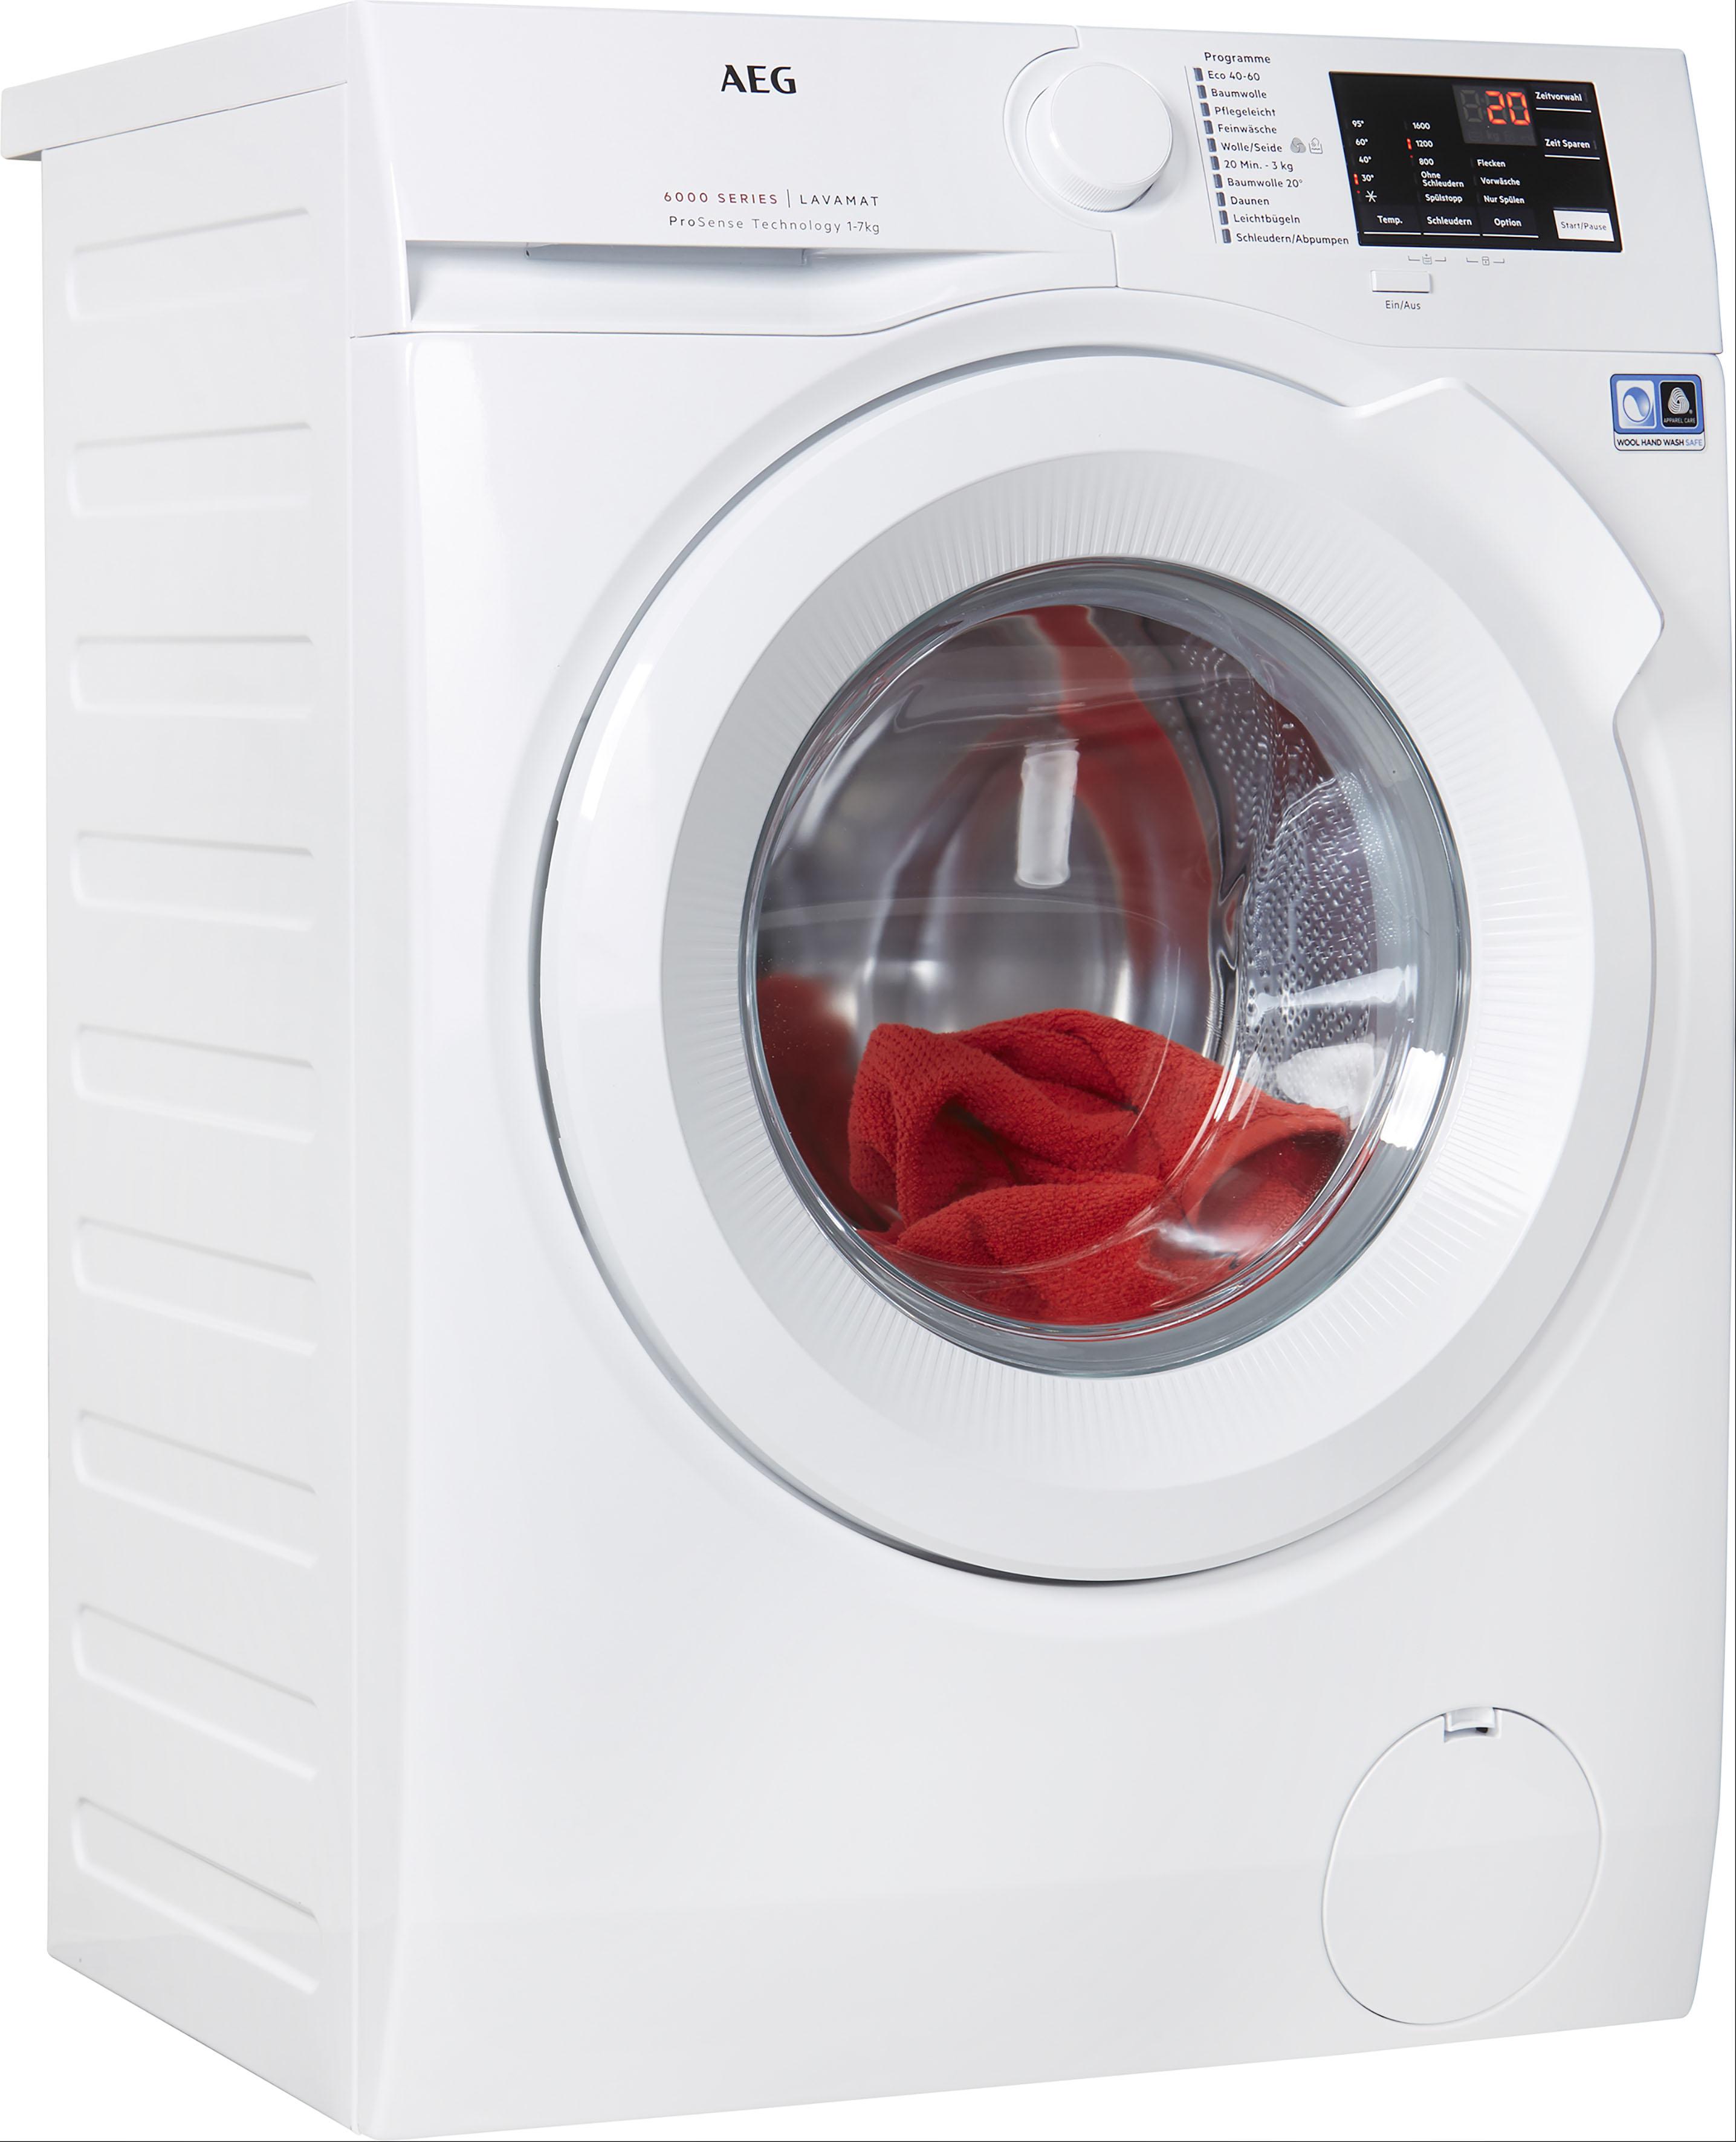 AEG Waschmaschine, L6FBA5670 EEK A+++ weiß Waschmaschinen Haushaltsgeräte Waschmaschine